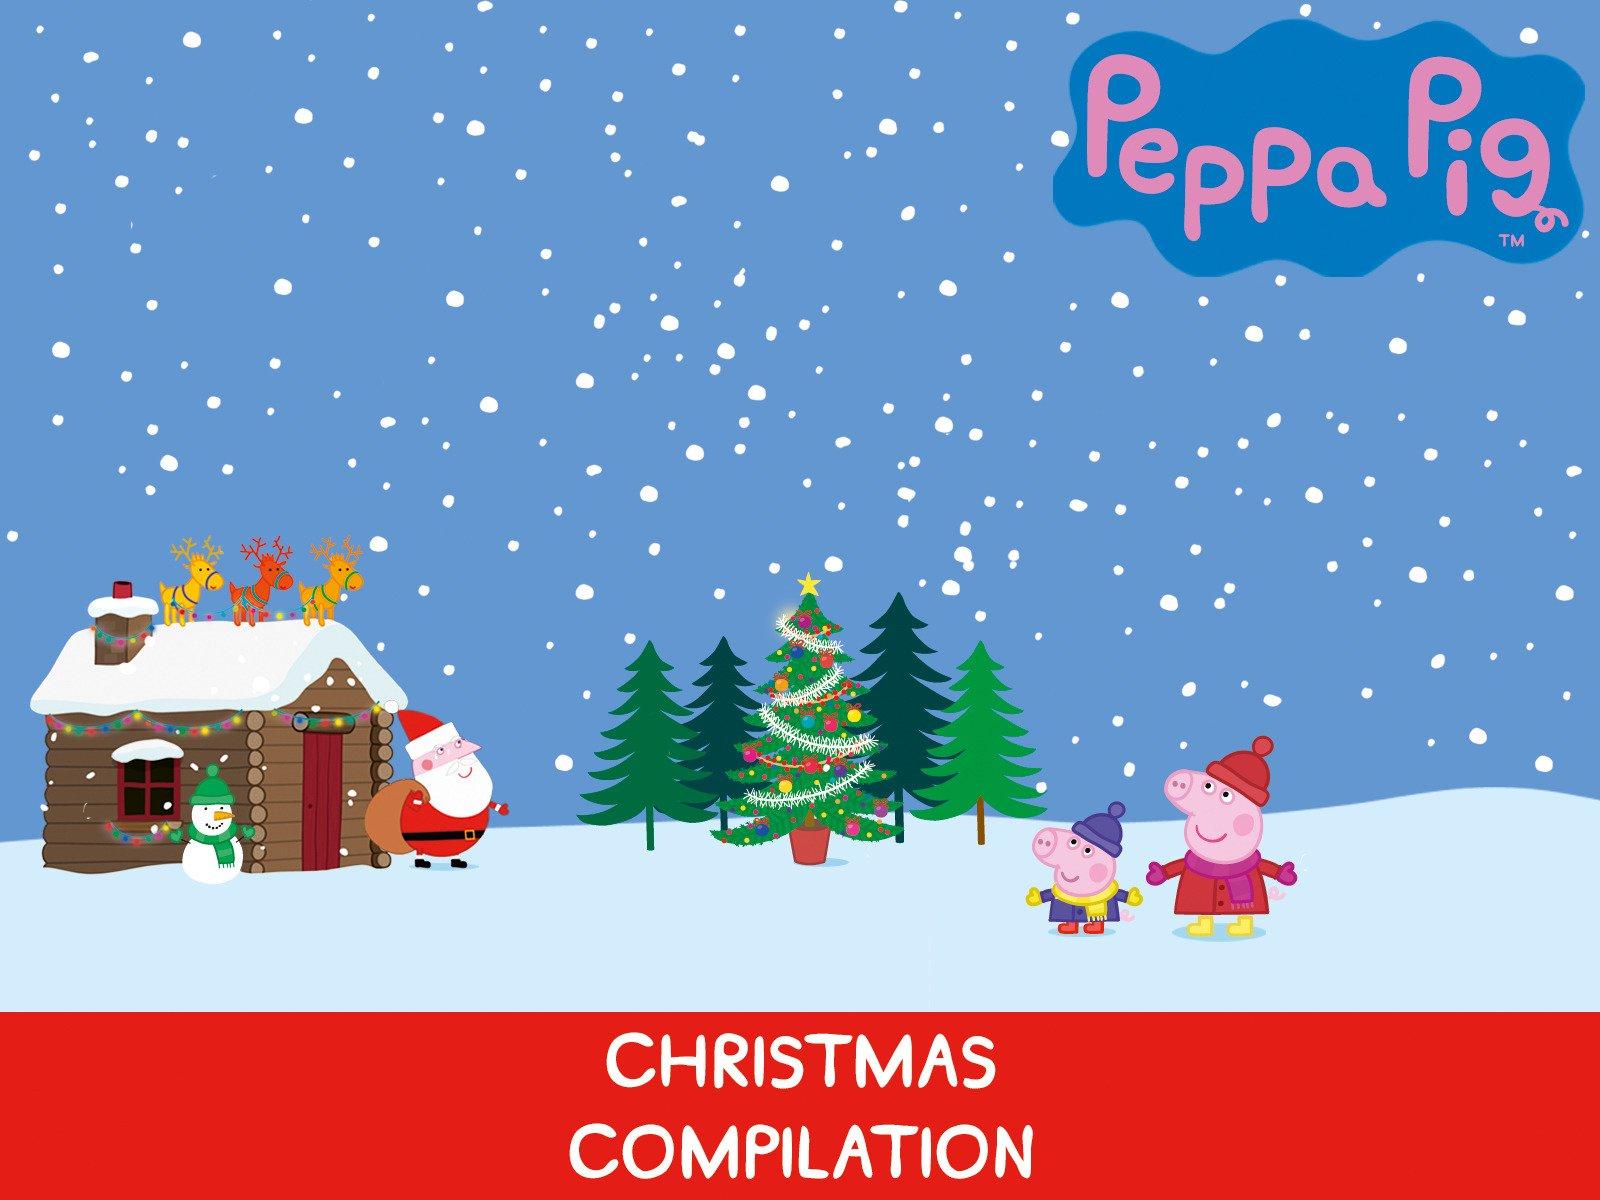 Peppa Pig Christmas.Amazon Co Uk Watch Peppa Pig Christmas Compilation